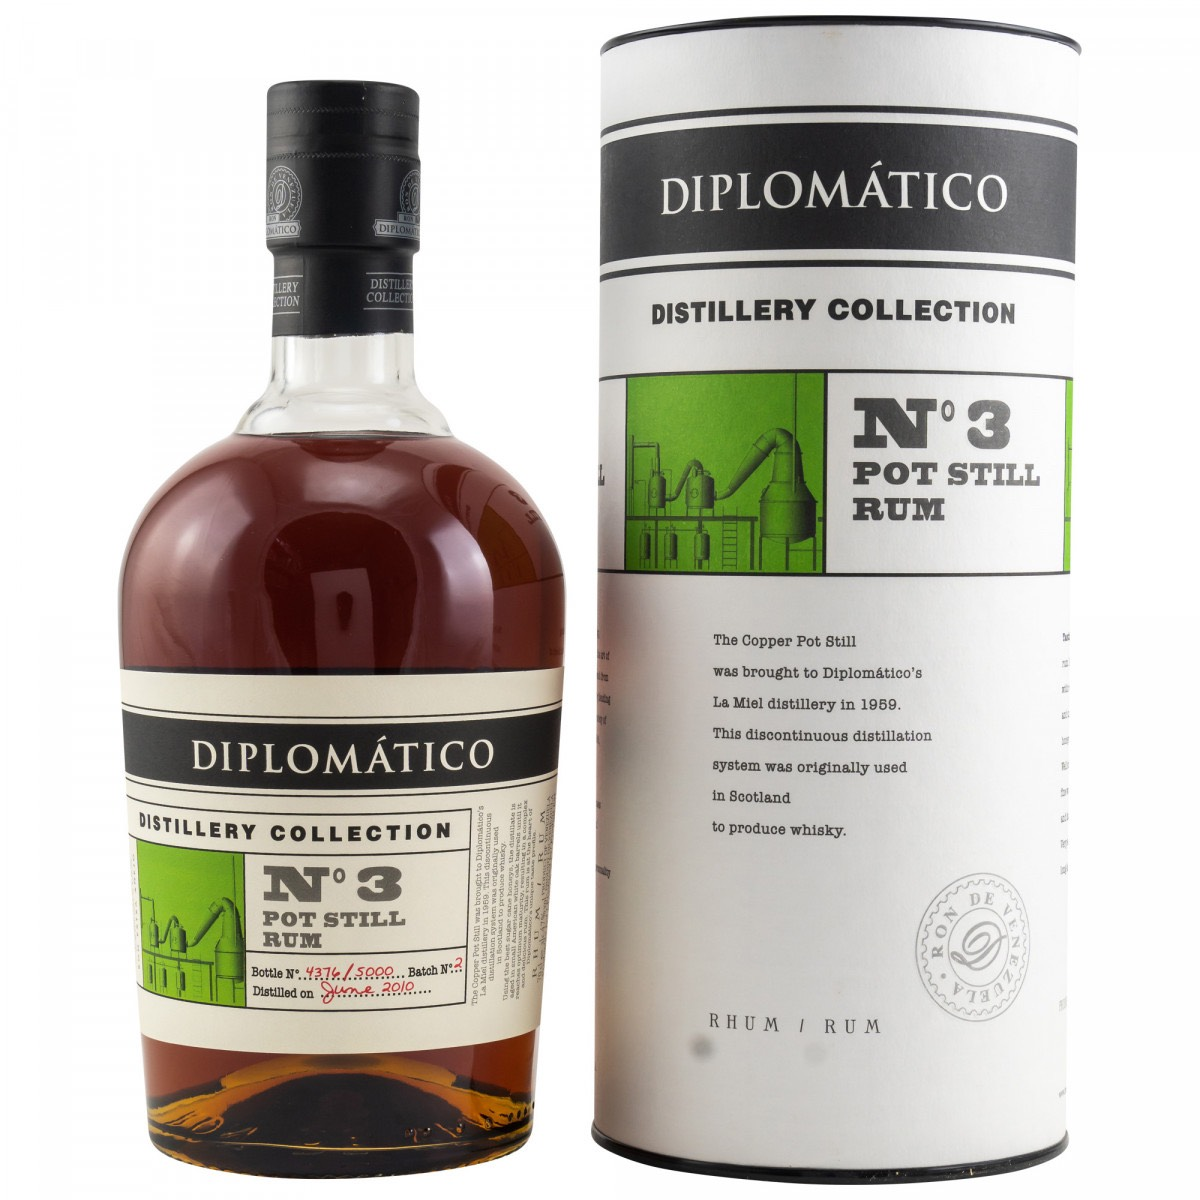 Bottle image of Diplomático / Botucal No. 3 Pot Still Rum